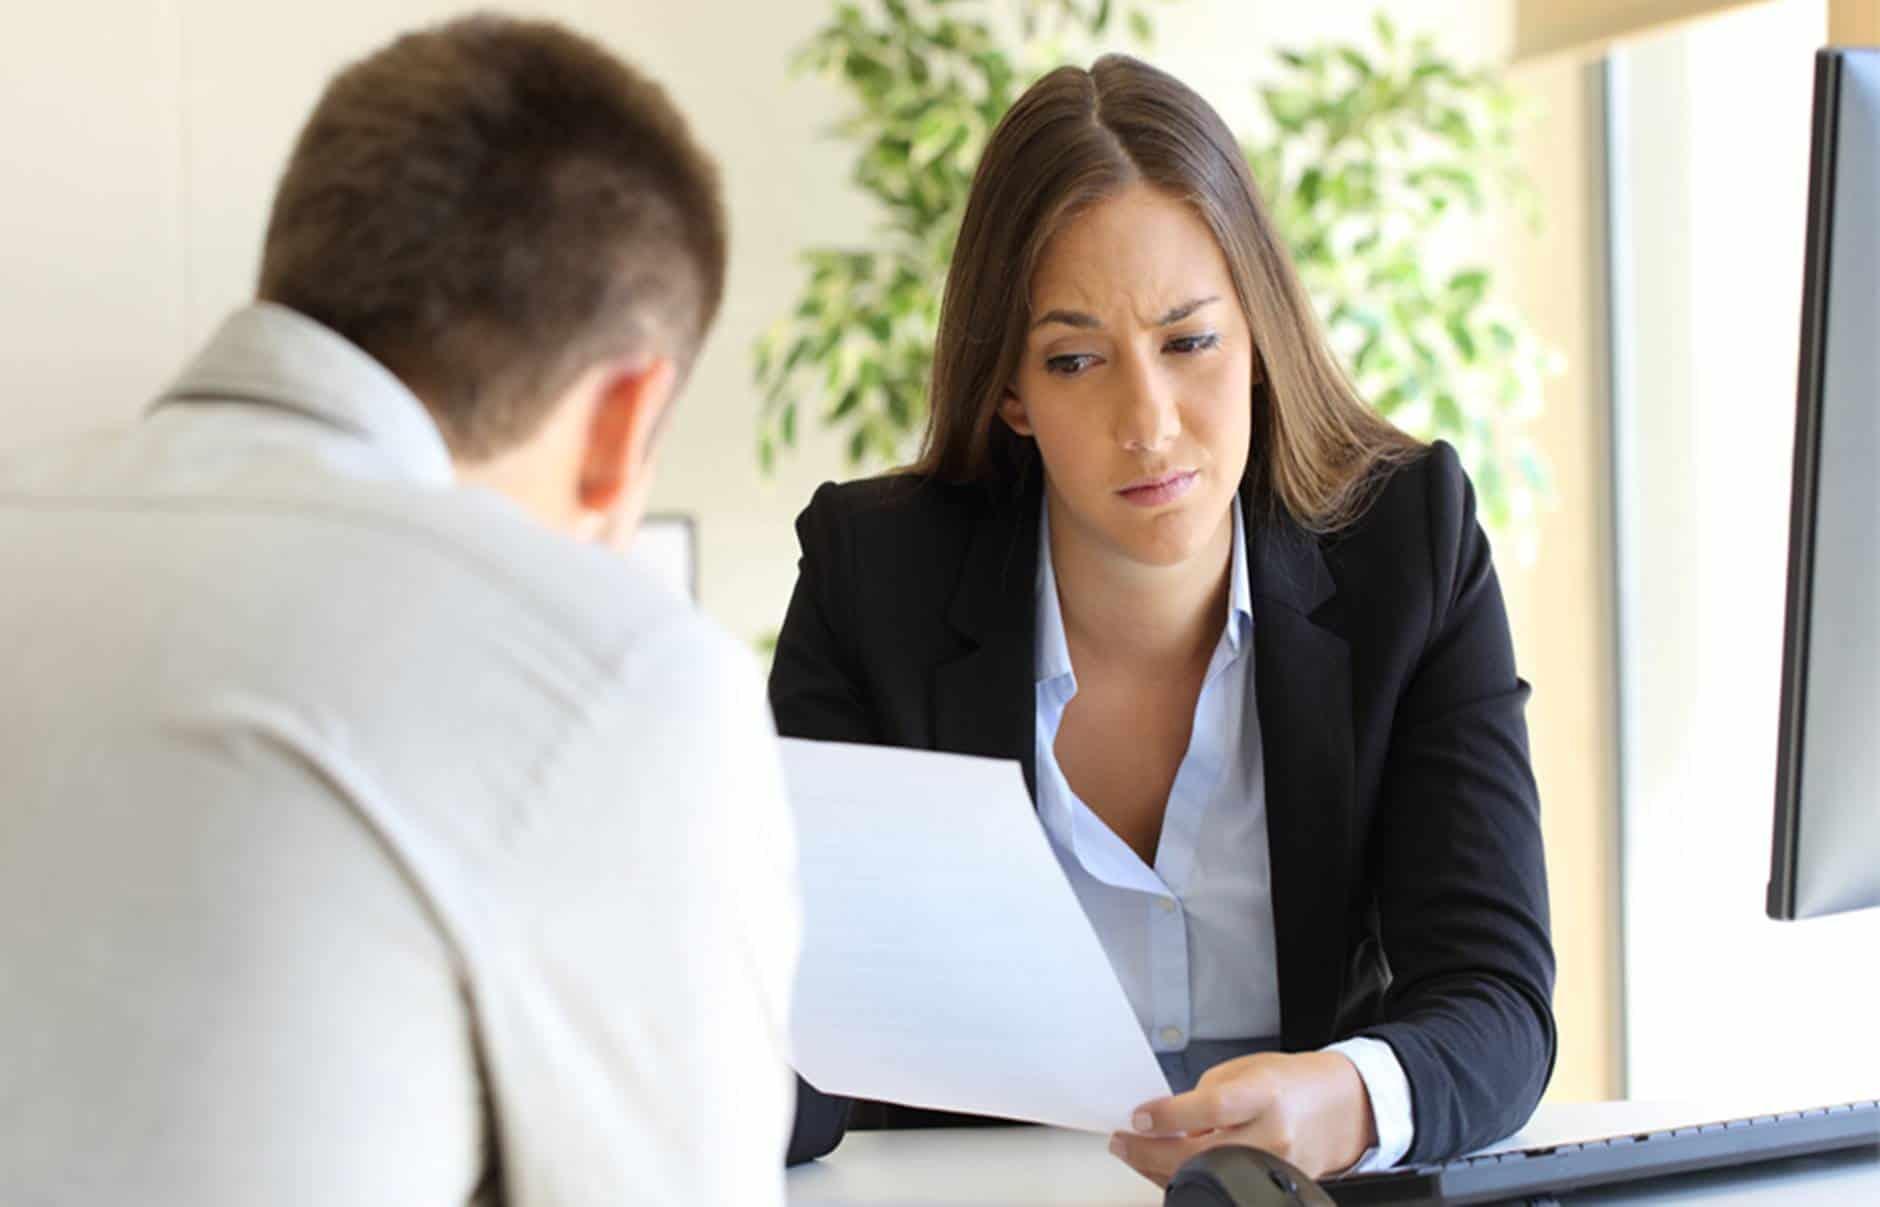 ciee dica entrevista emprego (1)